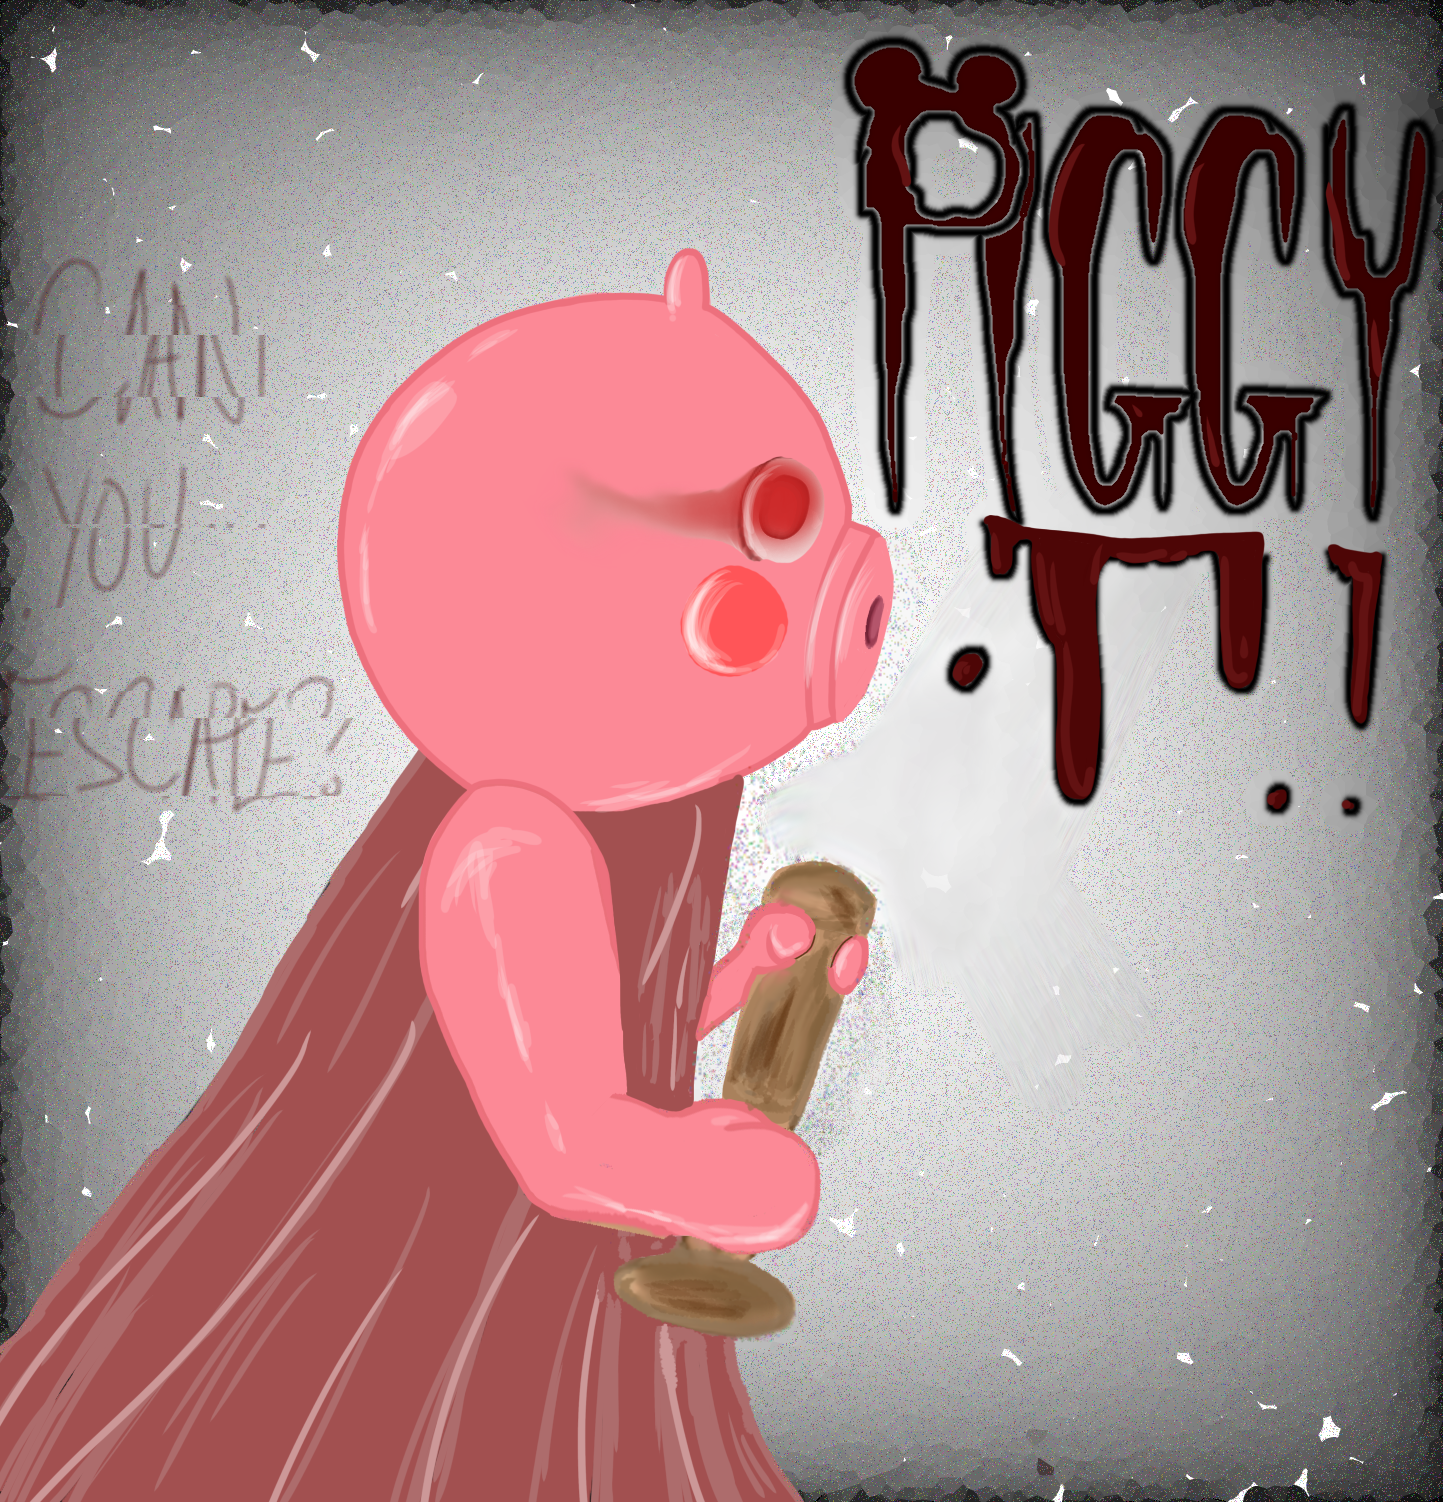 Roblox Font Deviantart Roblox Piggy Comic Cover By Pastelaesthxtiq On Deviantart